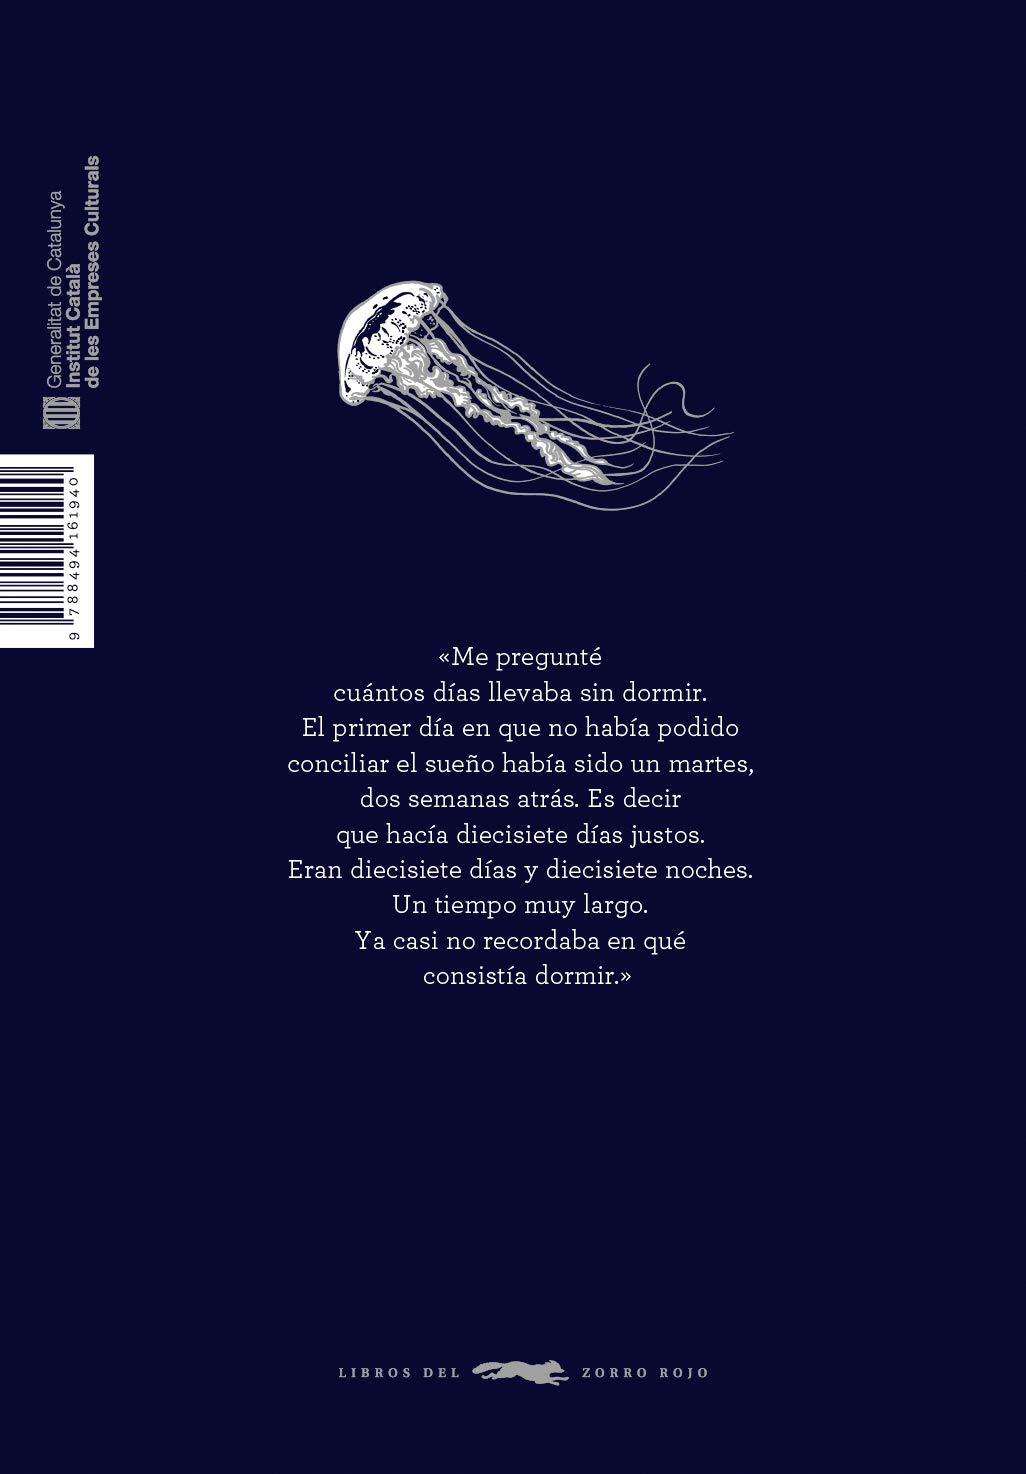 Sueño (Serie Illustrata / Murakami): Amazon.es: Haruki ...